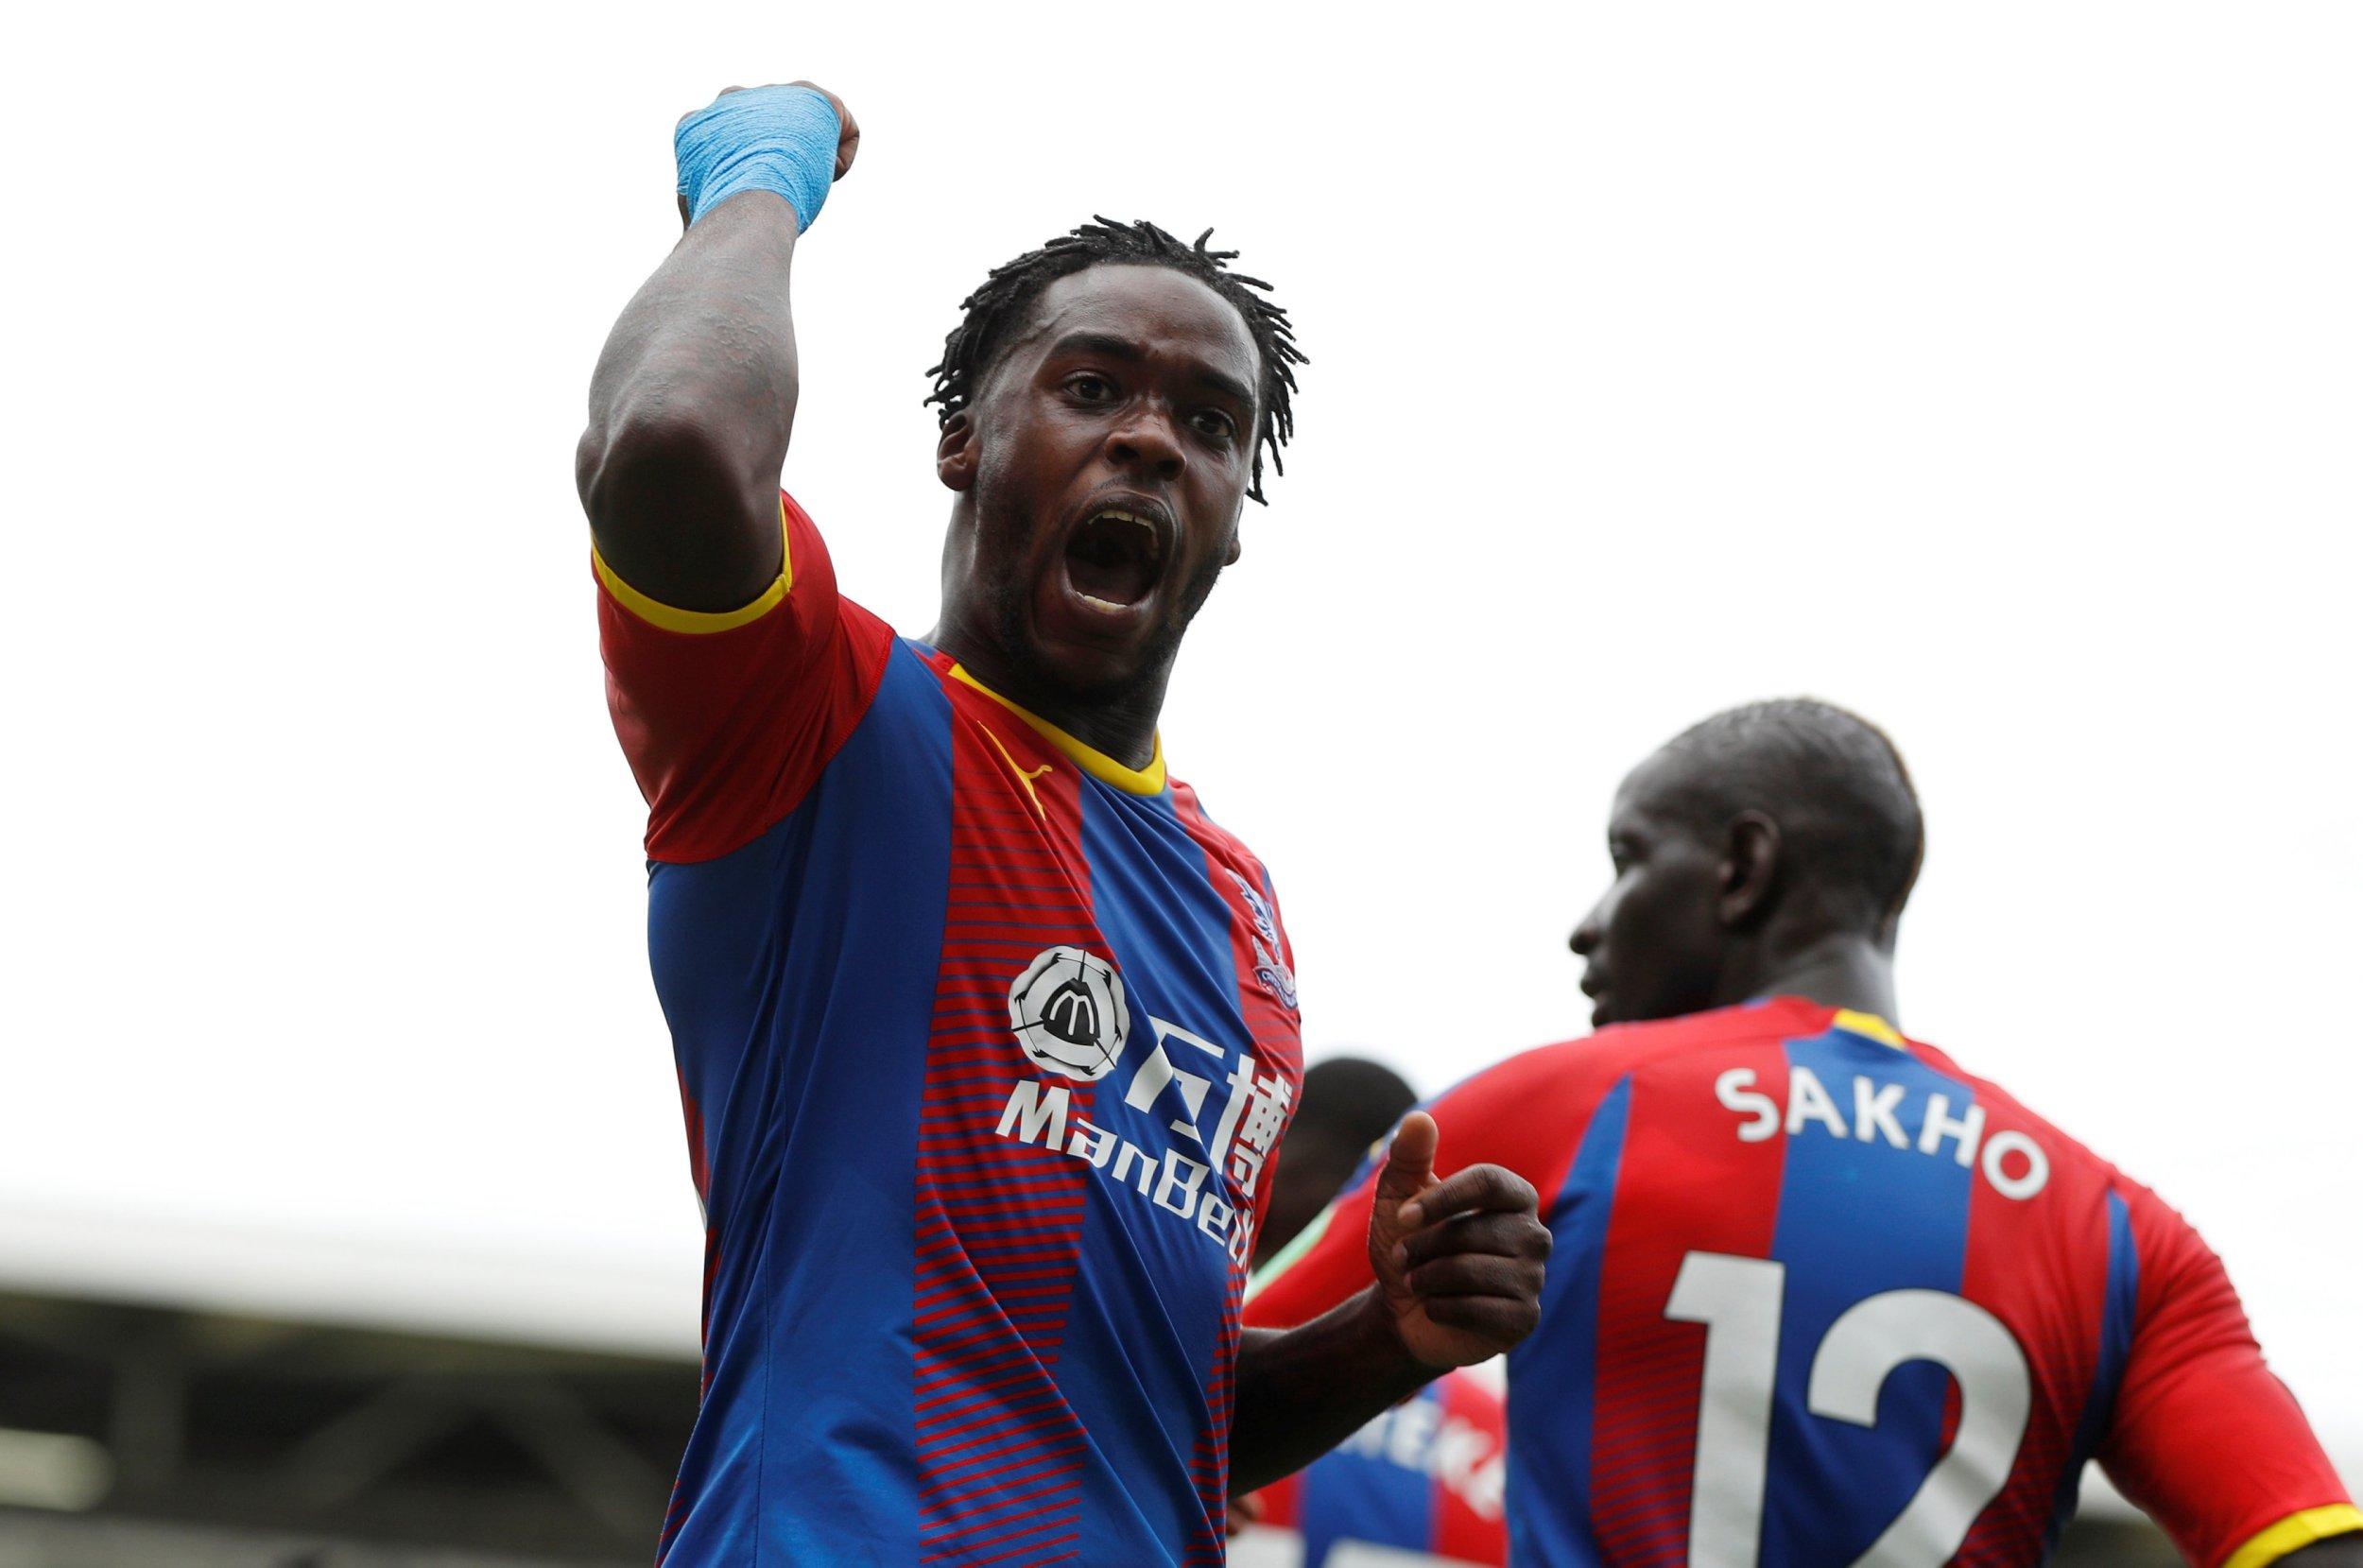 Performance of Ghanaian players abroad: Schlupp, Acheampong, Adjei-Boateng, Nasiru score as Amartey struggles